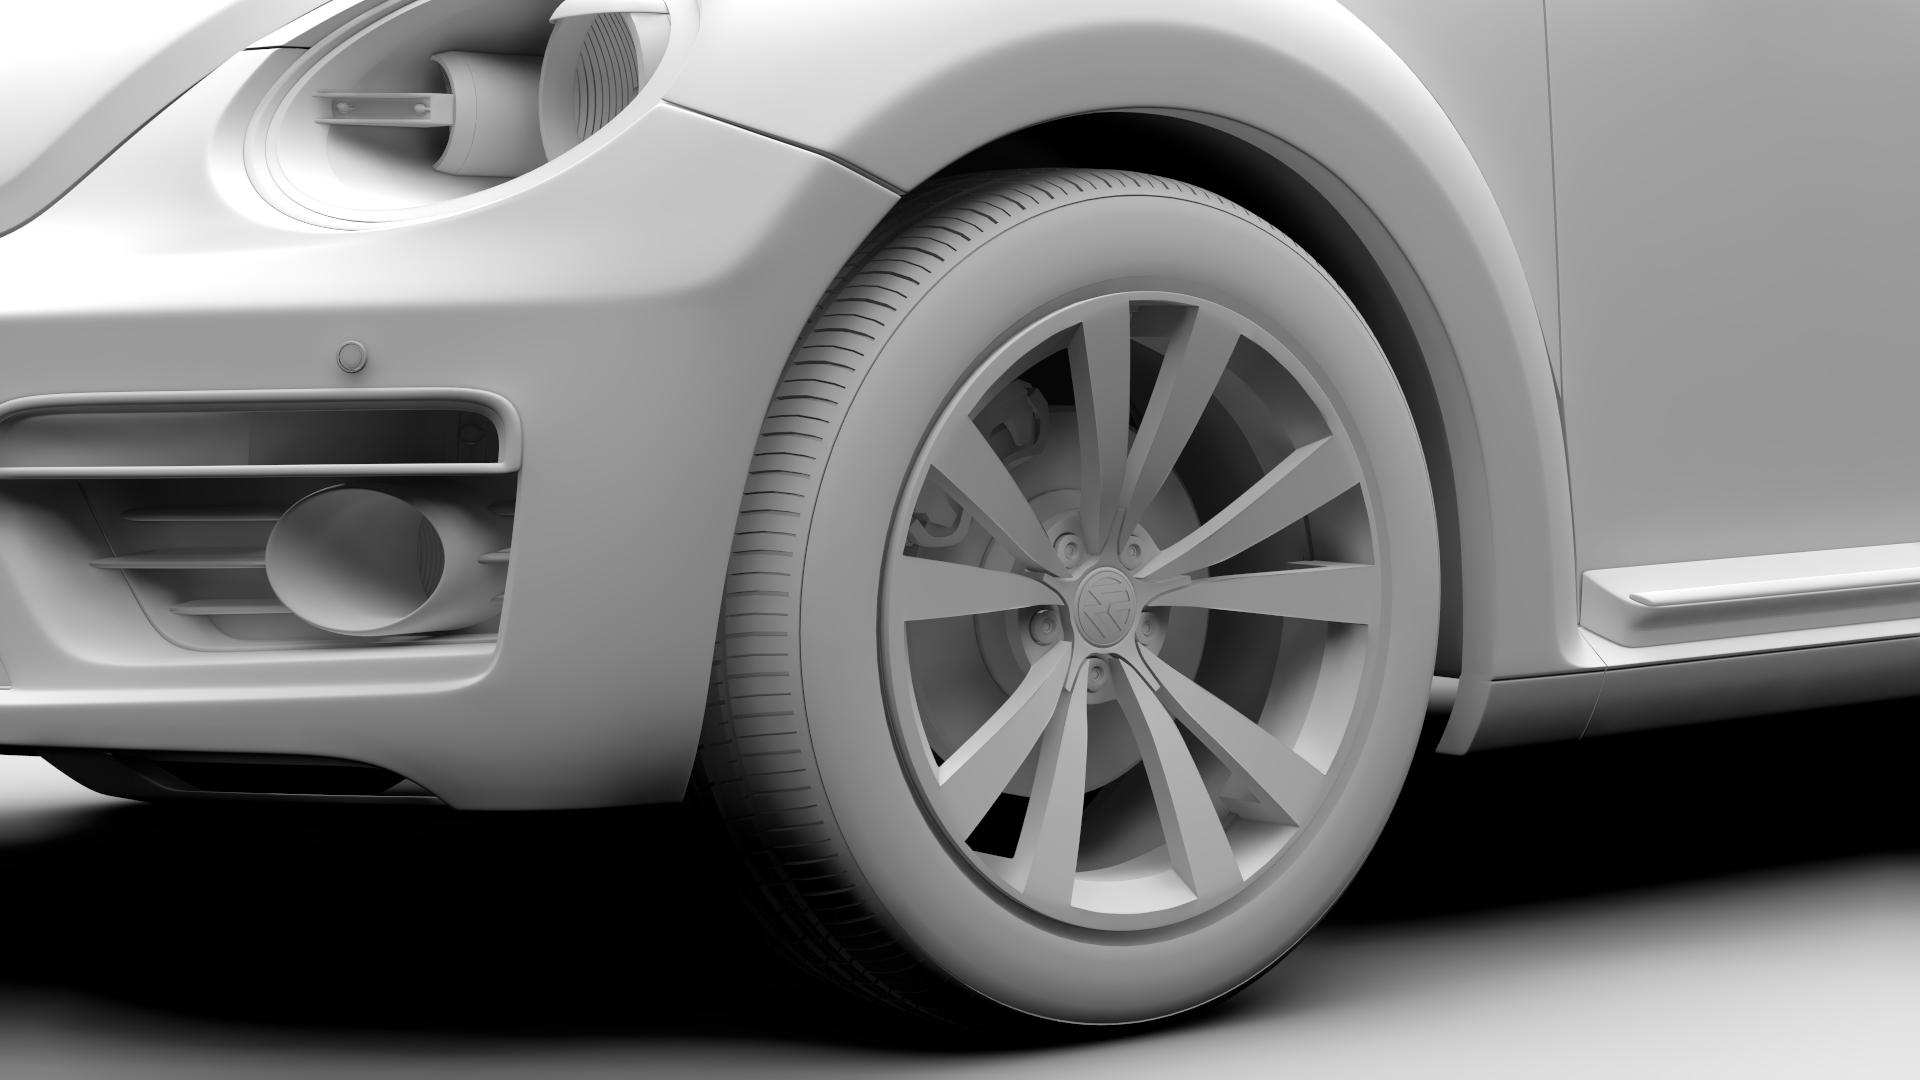 vw beetle cabriolet 2017 3d model 3ds max fbx c4d lwo ma mb hrc xsi obj 221604